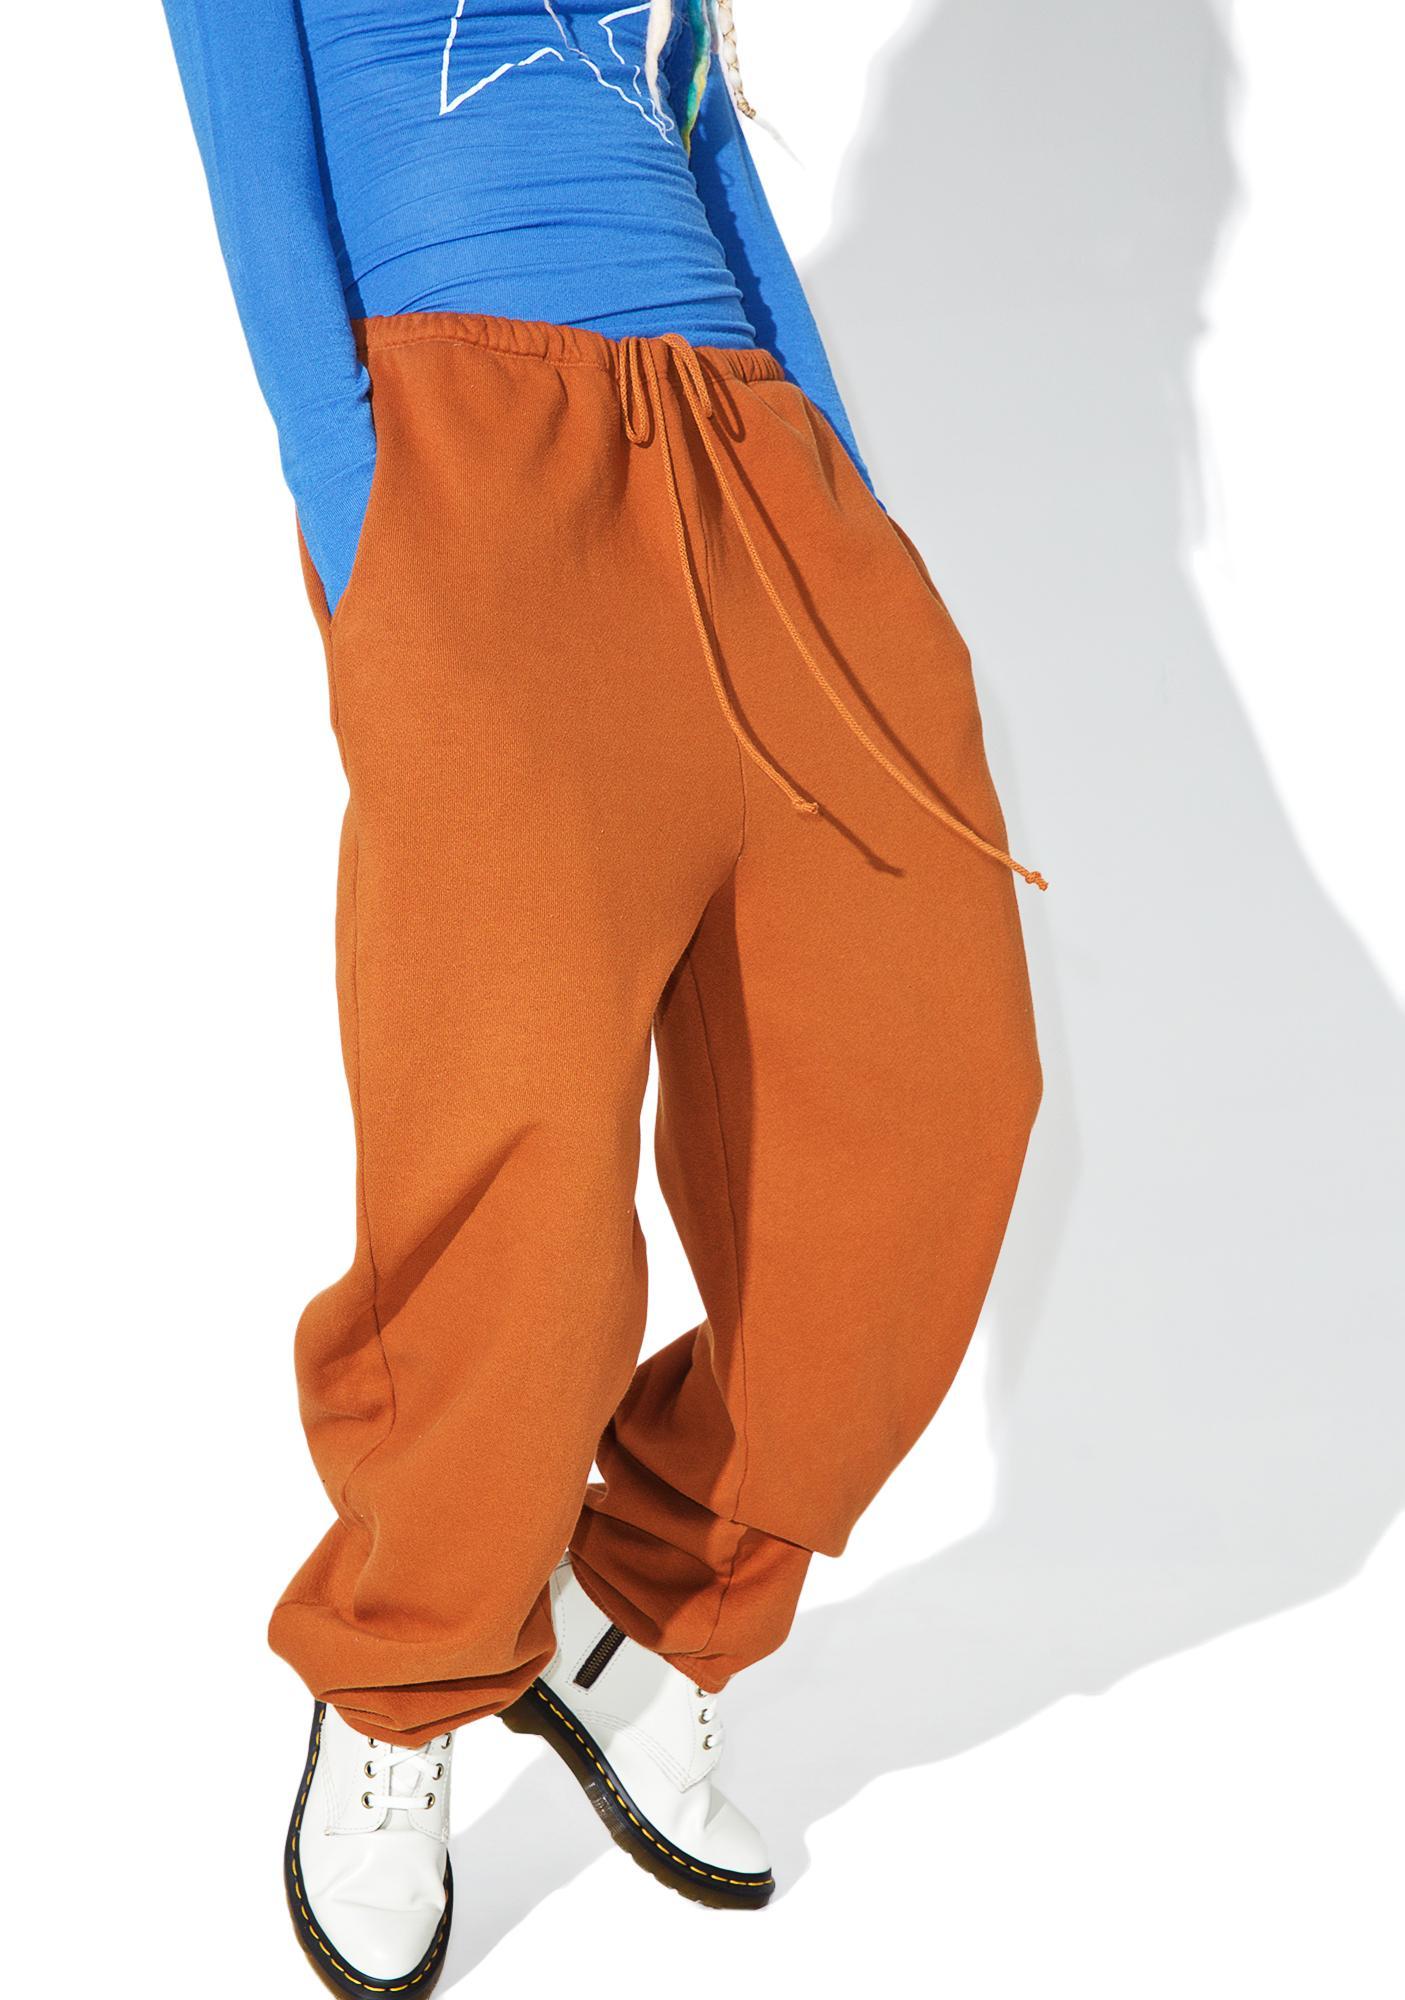 Daydream Nation High School Sweatpants